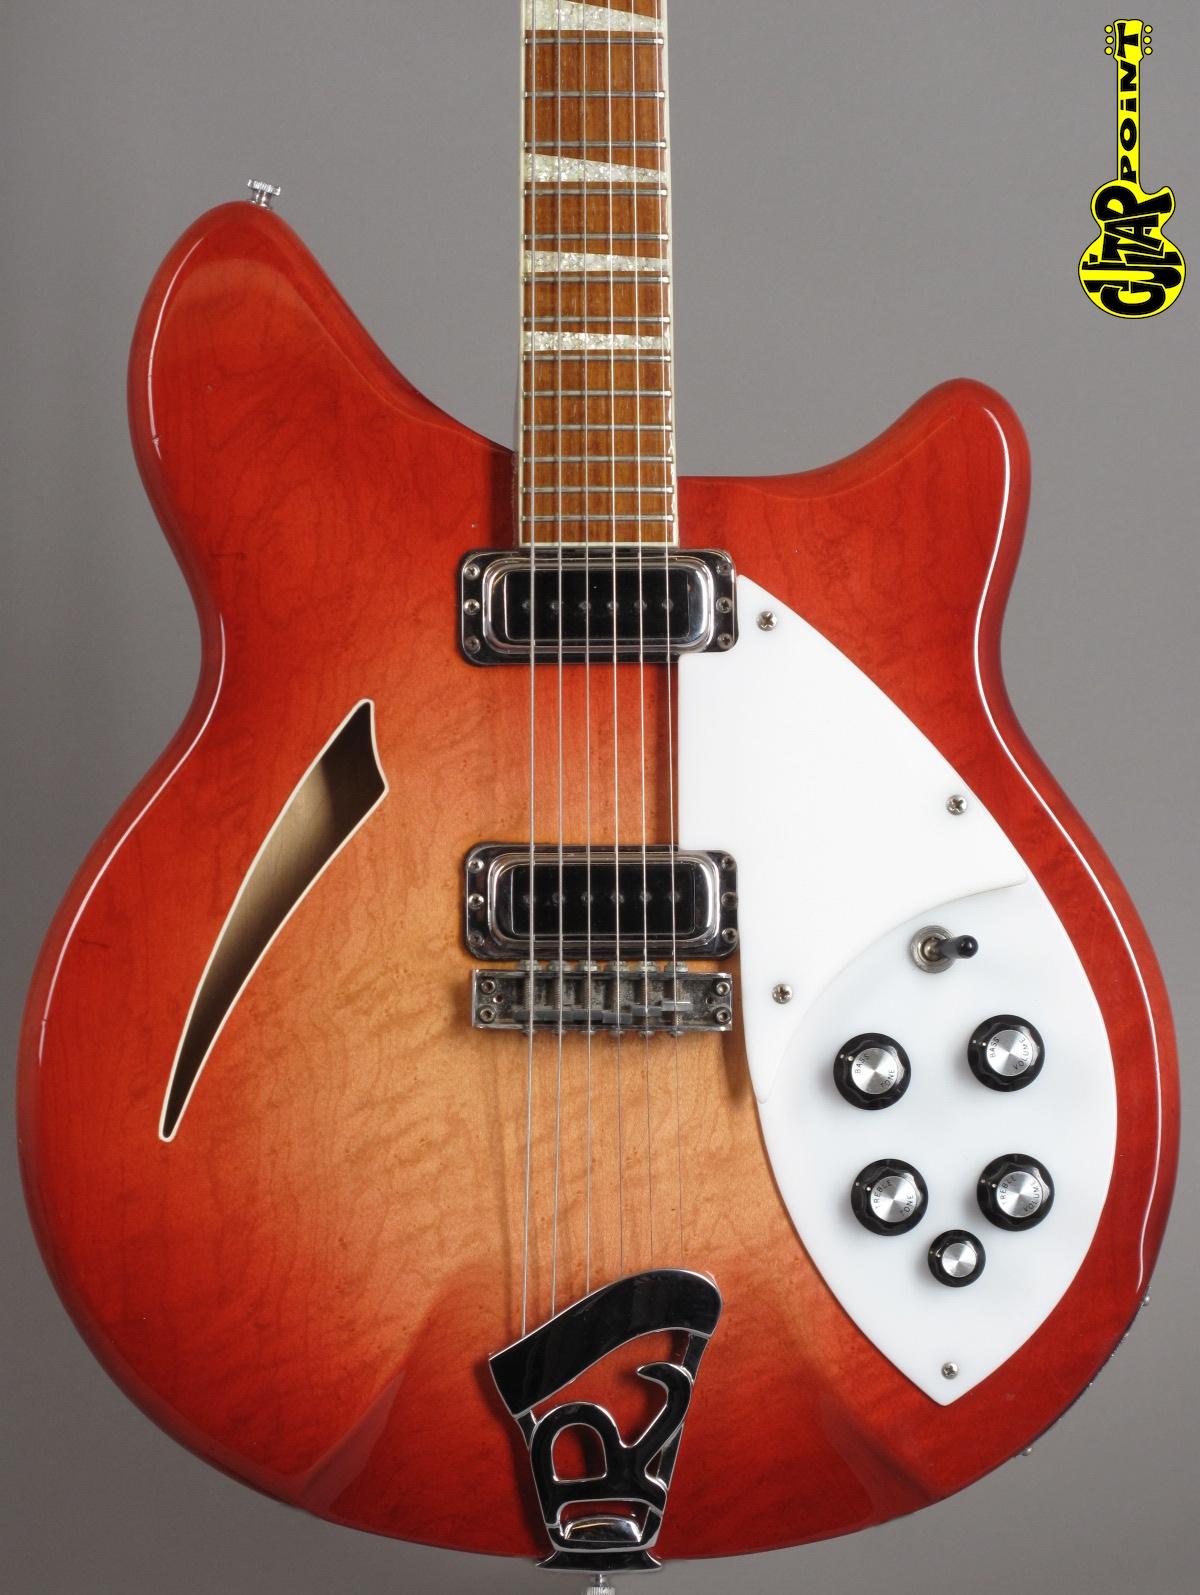 1973 Rickenbacker - 360 Fireglo